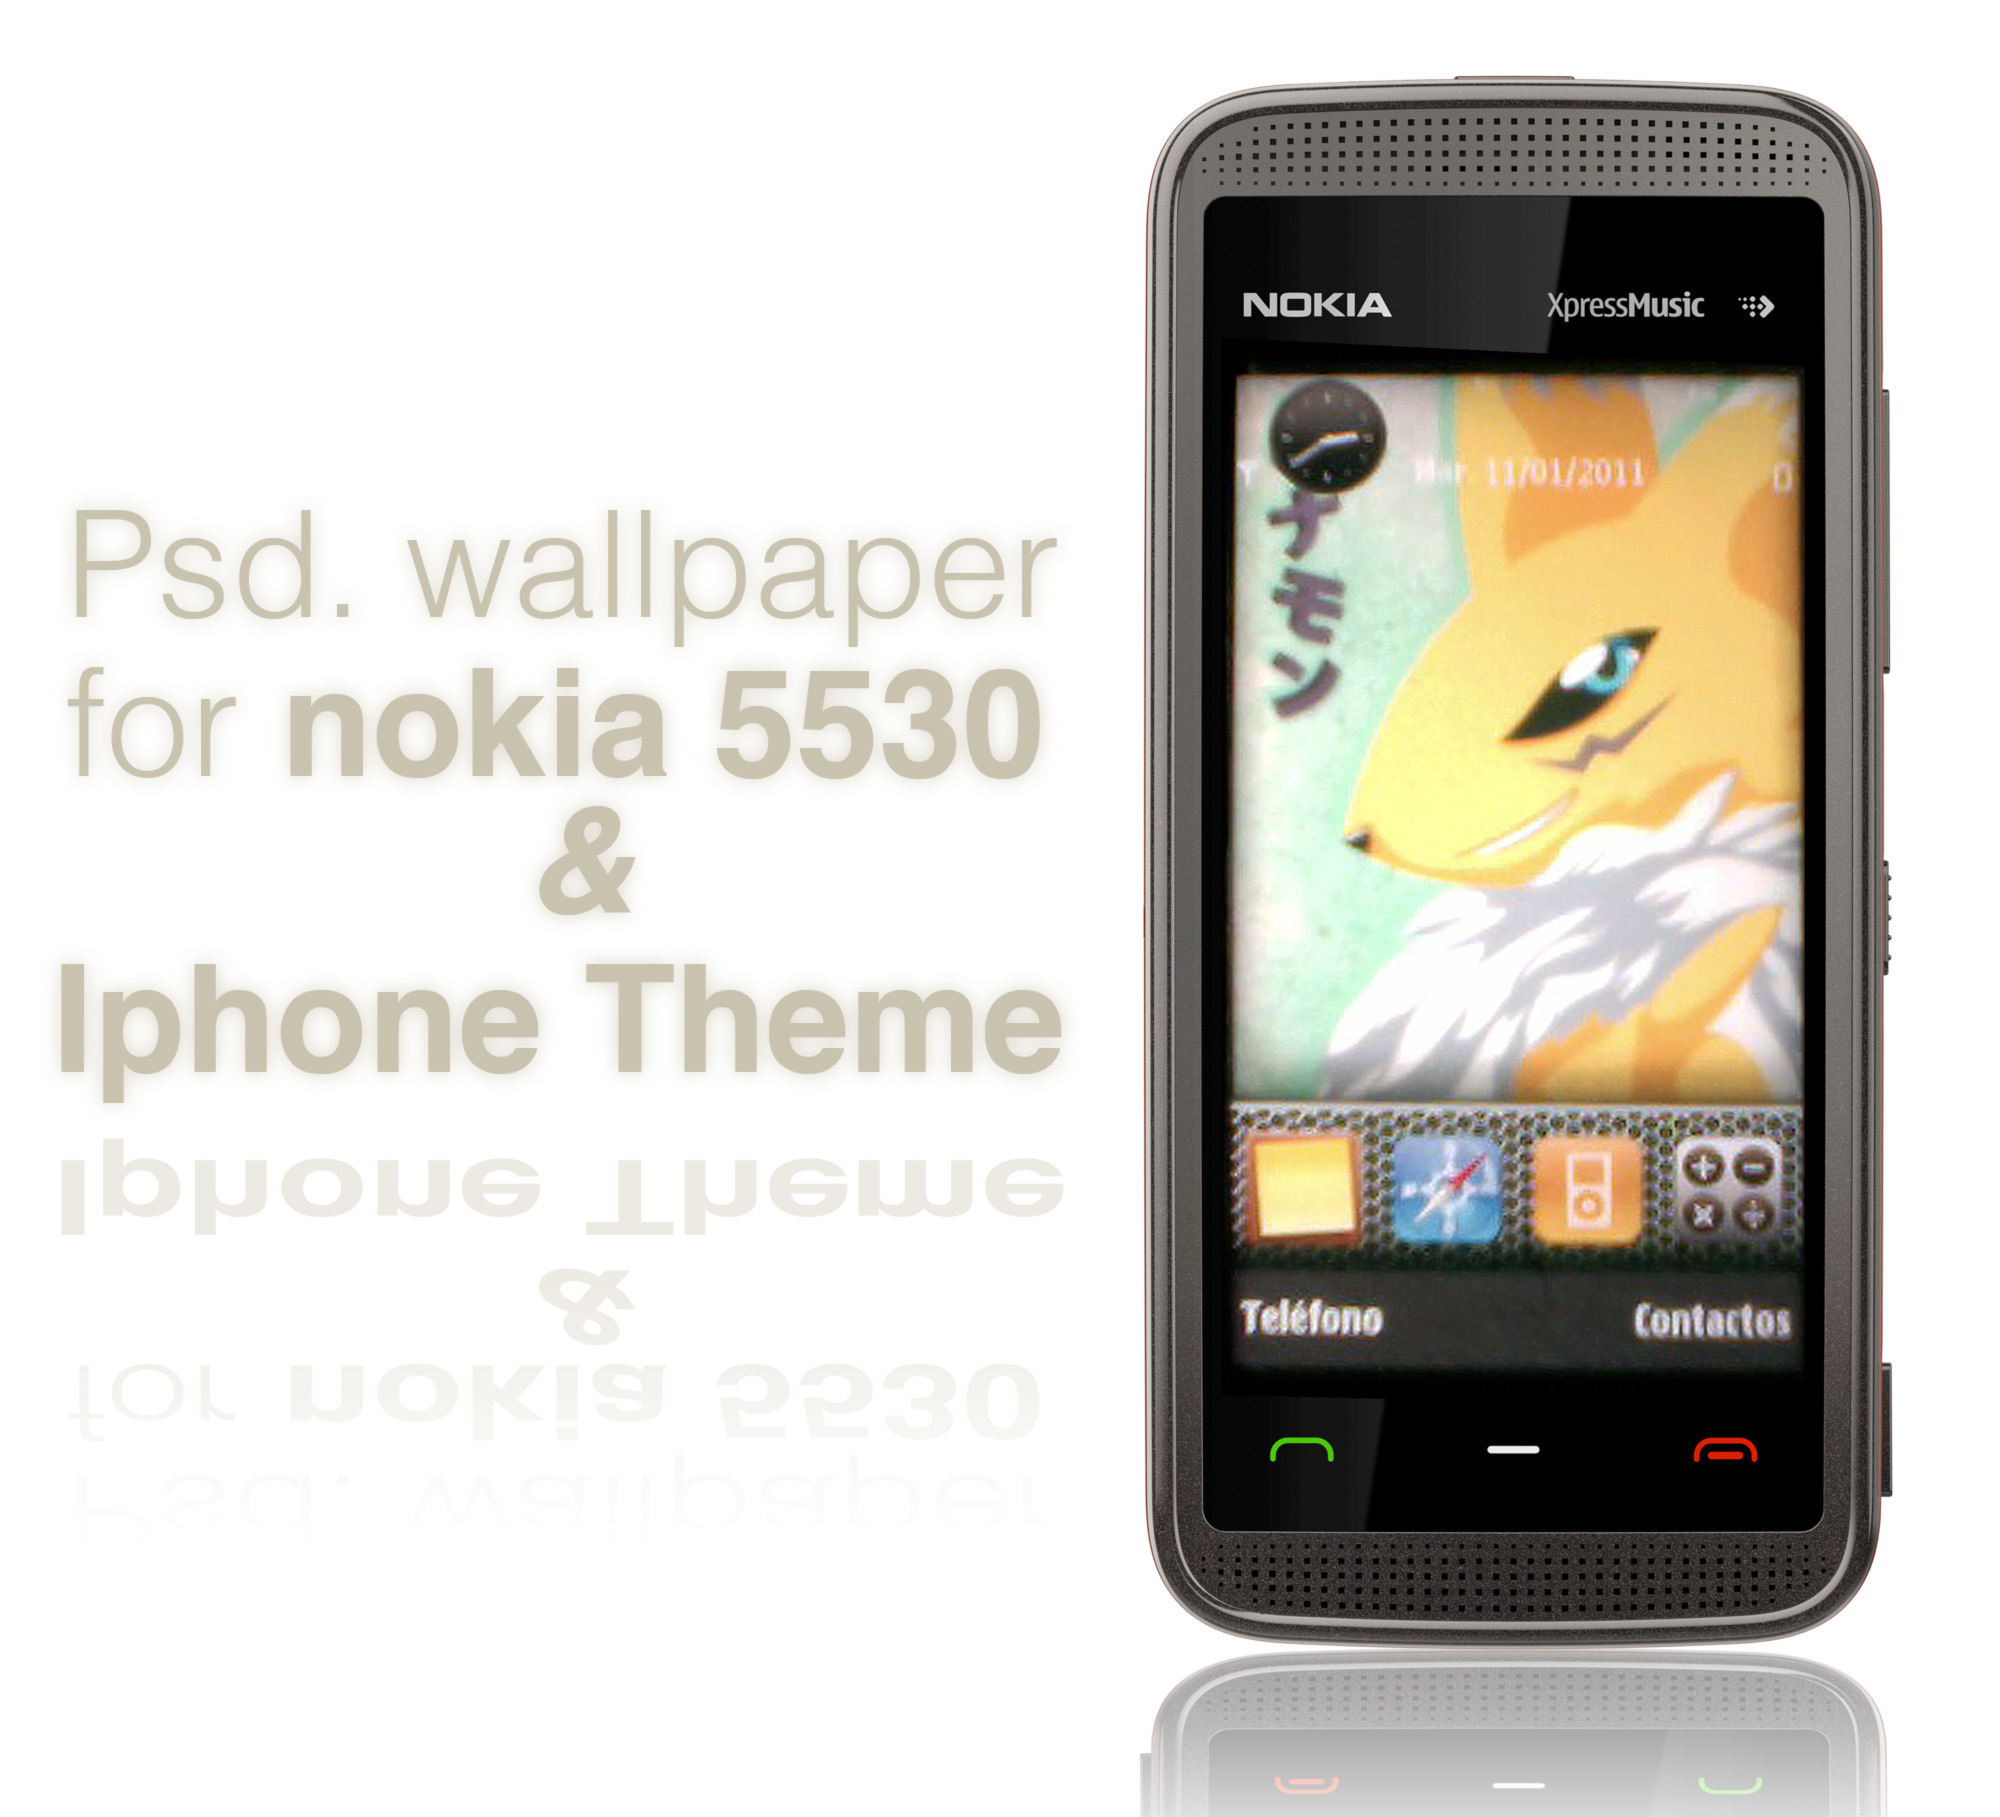 Nokia 5530 xpressmusic порно темы